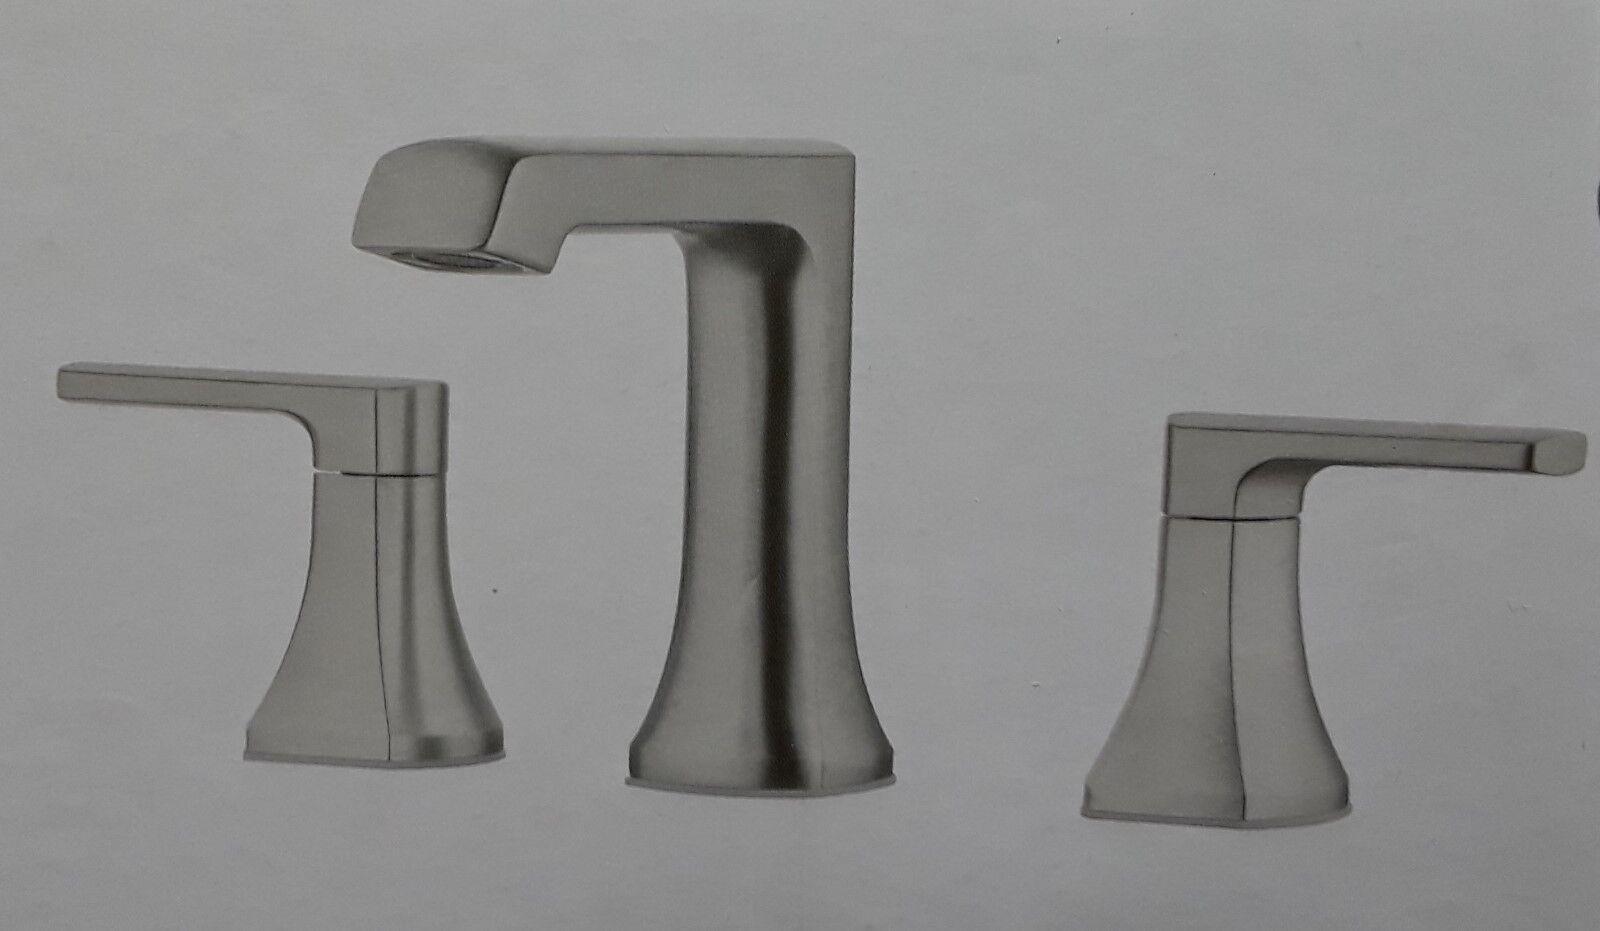 Pfister Brea LF-049-BRKK Widespread 2-Handle Waterfall Bath Faucet Brush Nickel